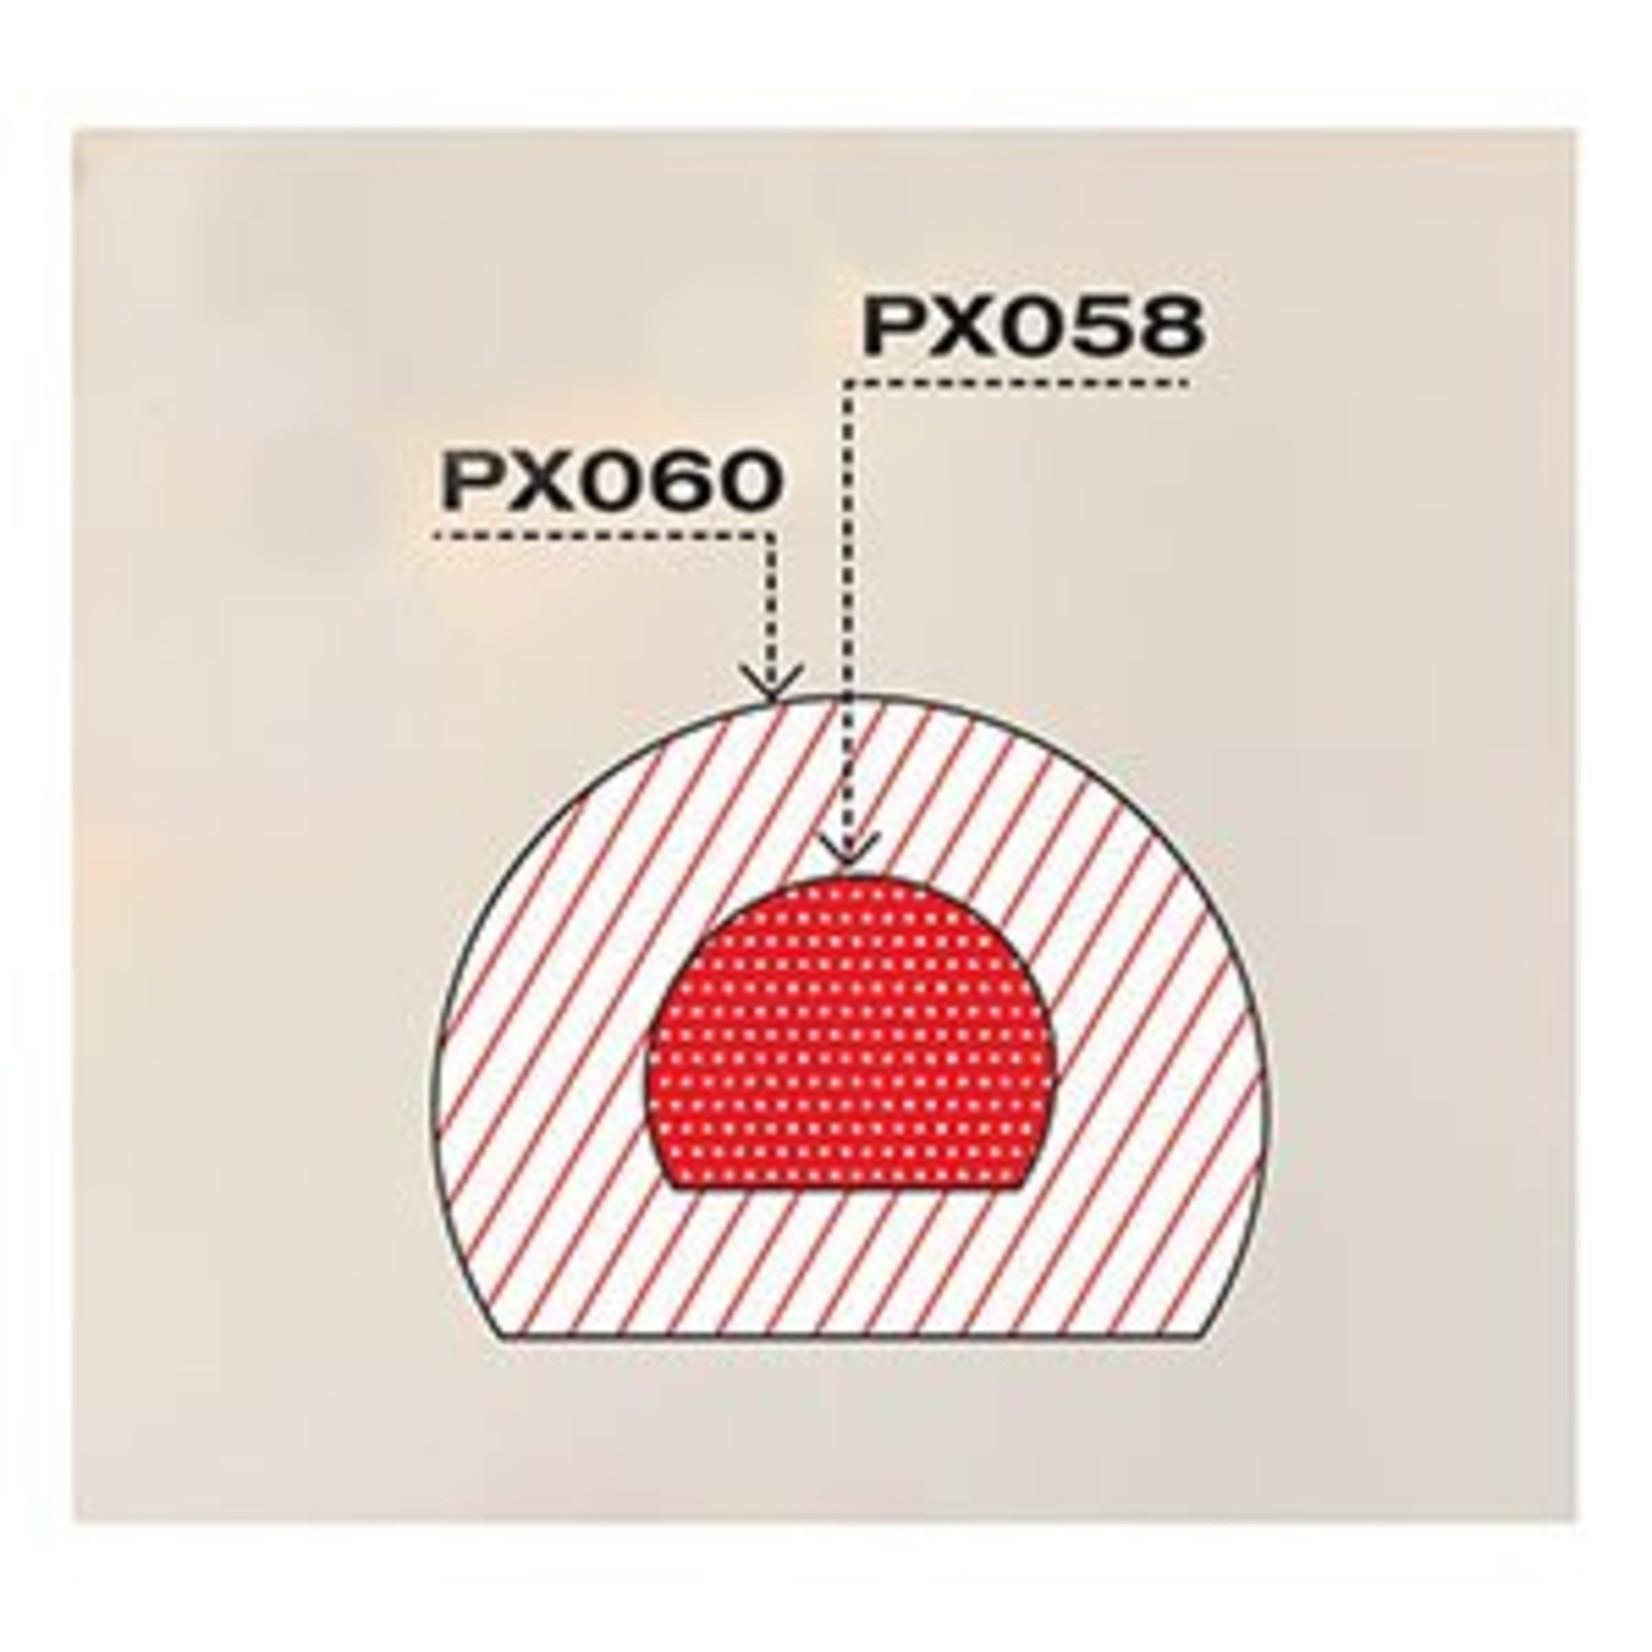 Pavoni Pavoni - Pavoflex silicone mold, Tronchetto, Mignon (9 cavity), PX058